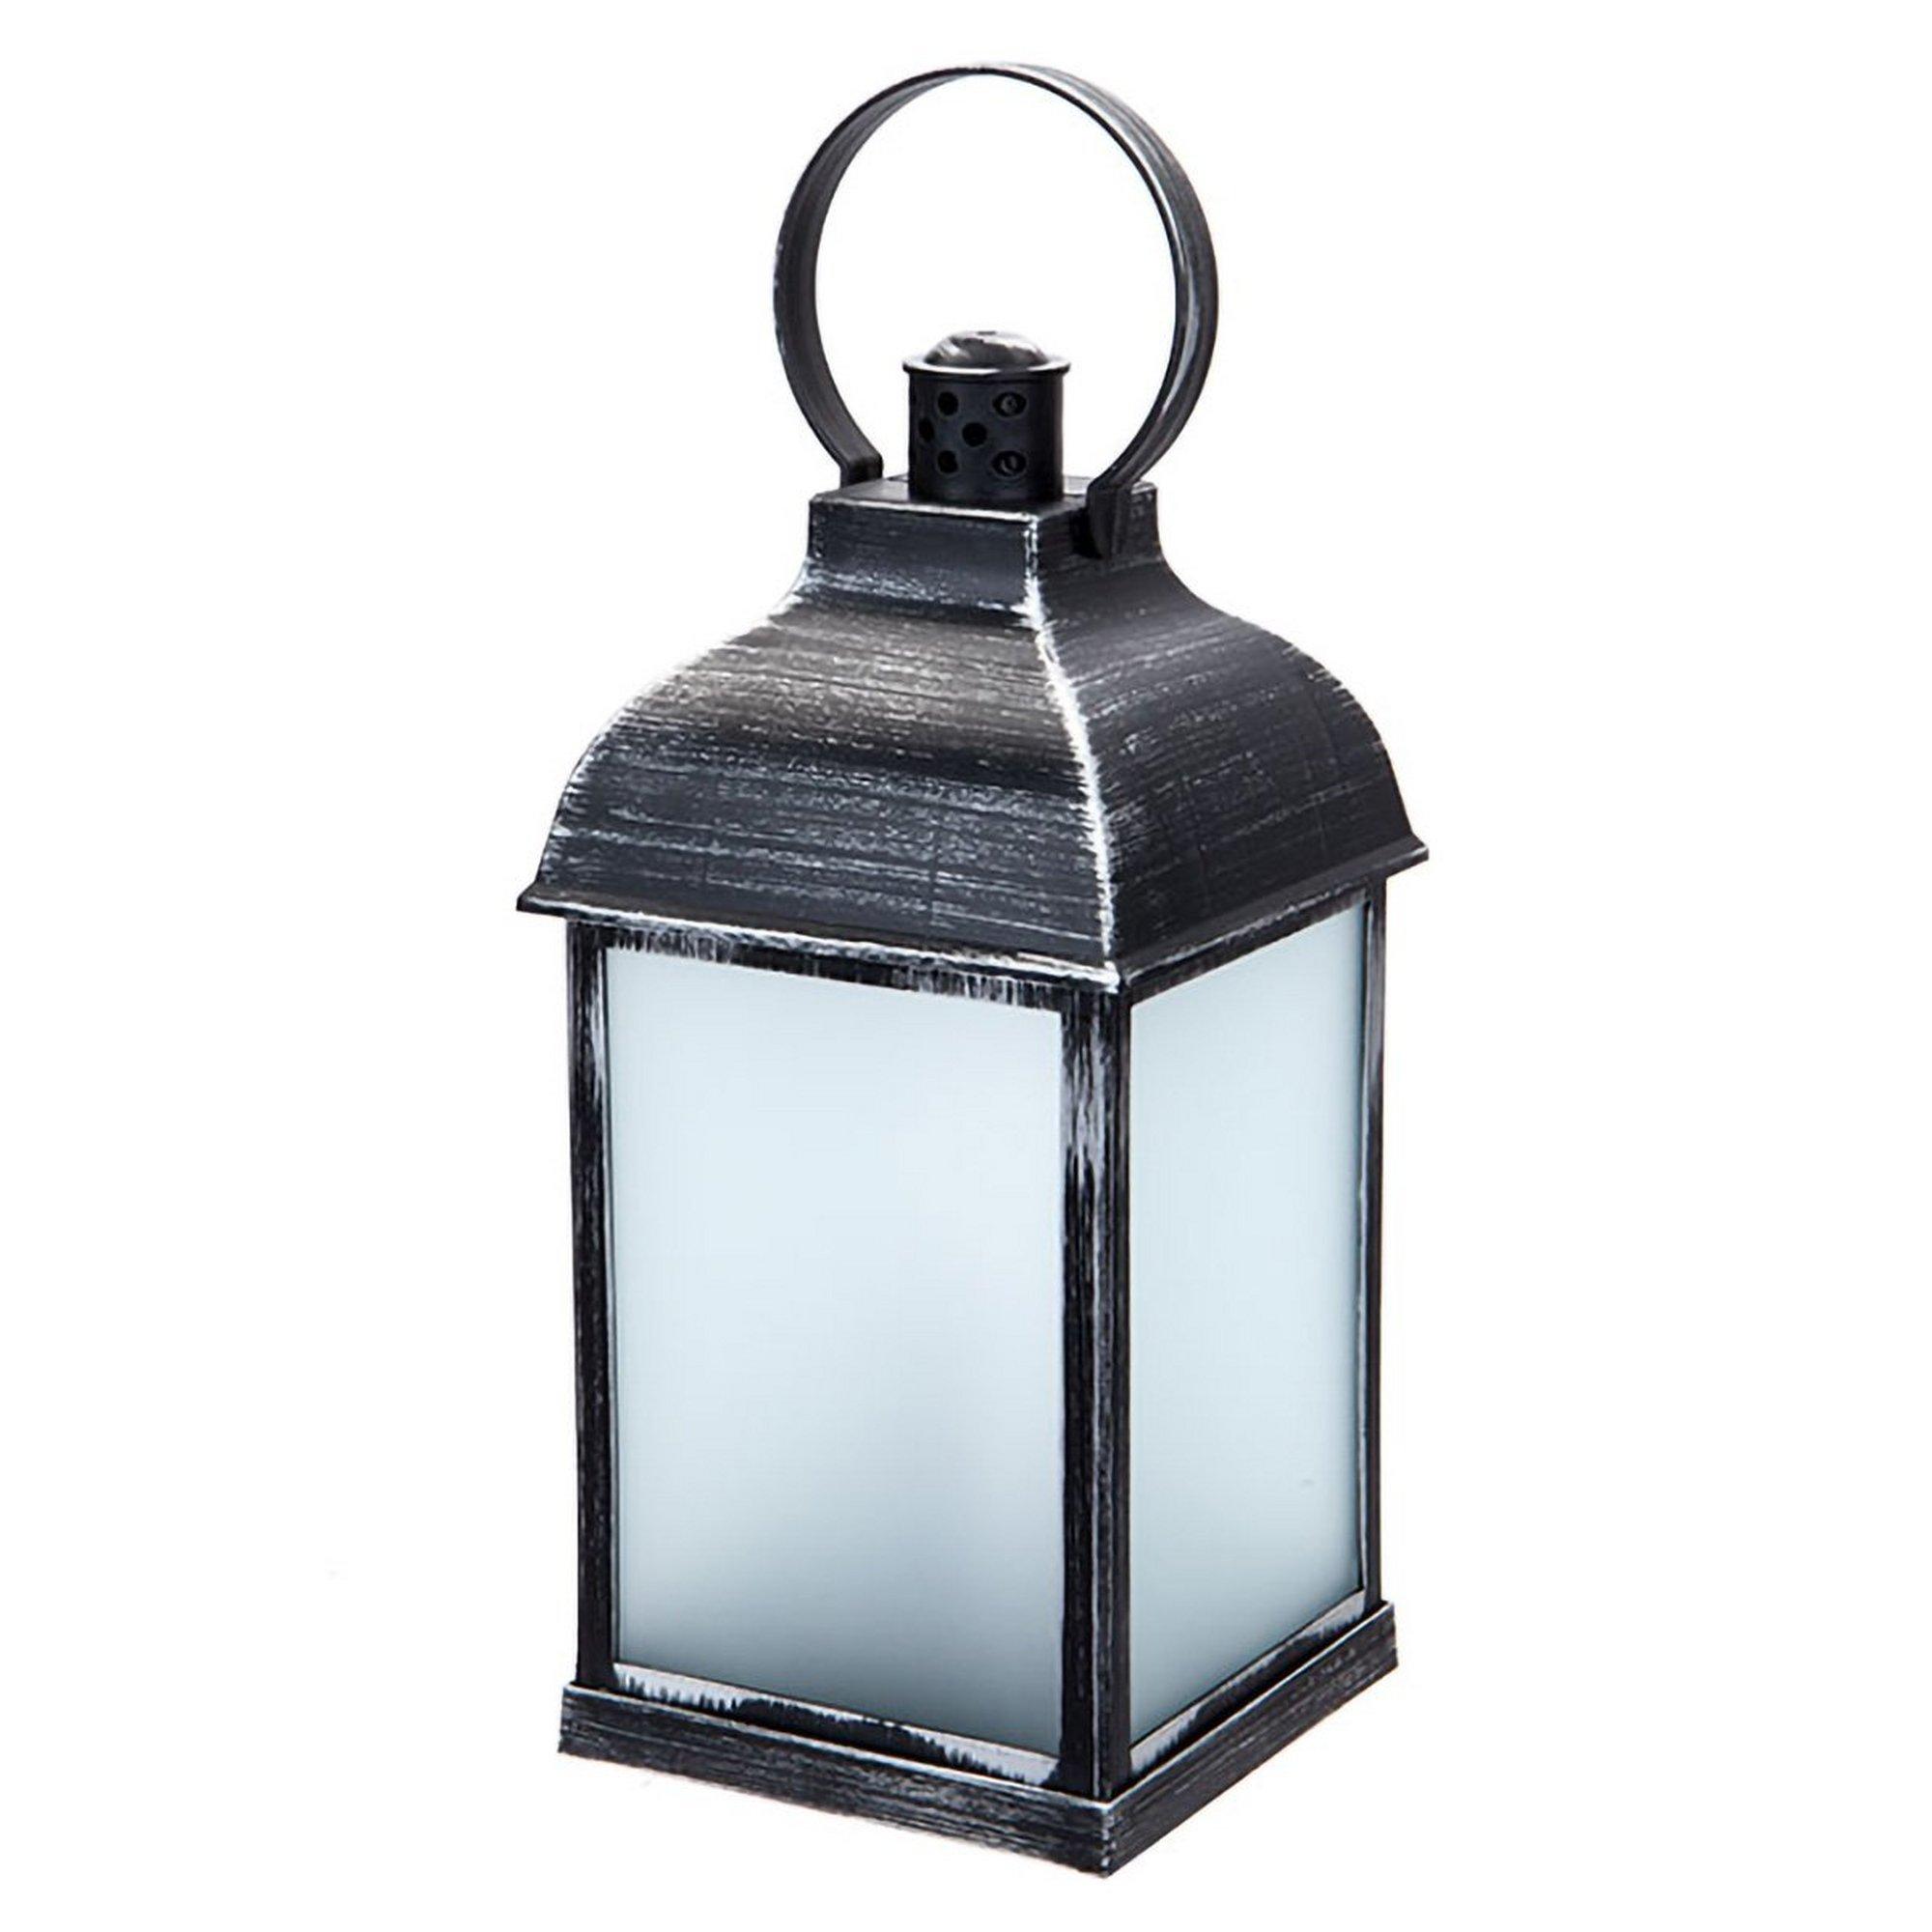 Image of Flame Effect Antique Dancing Lantern